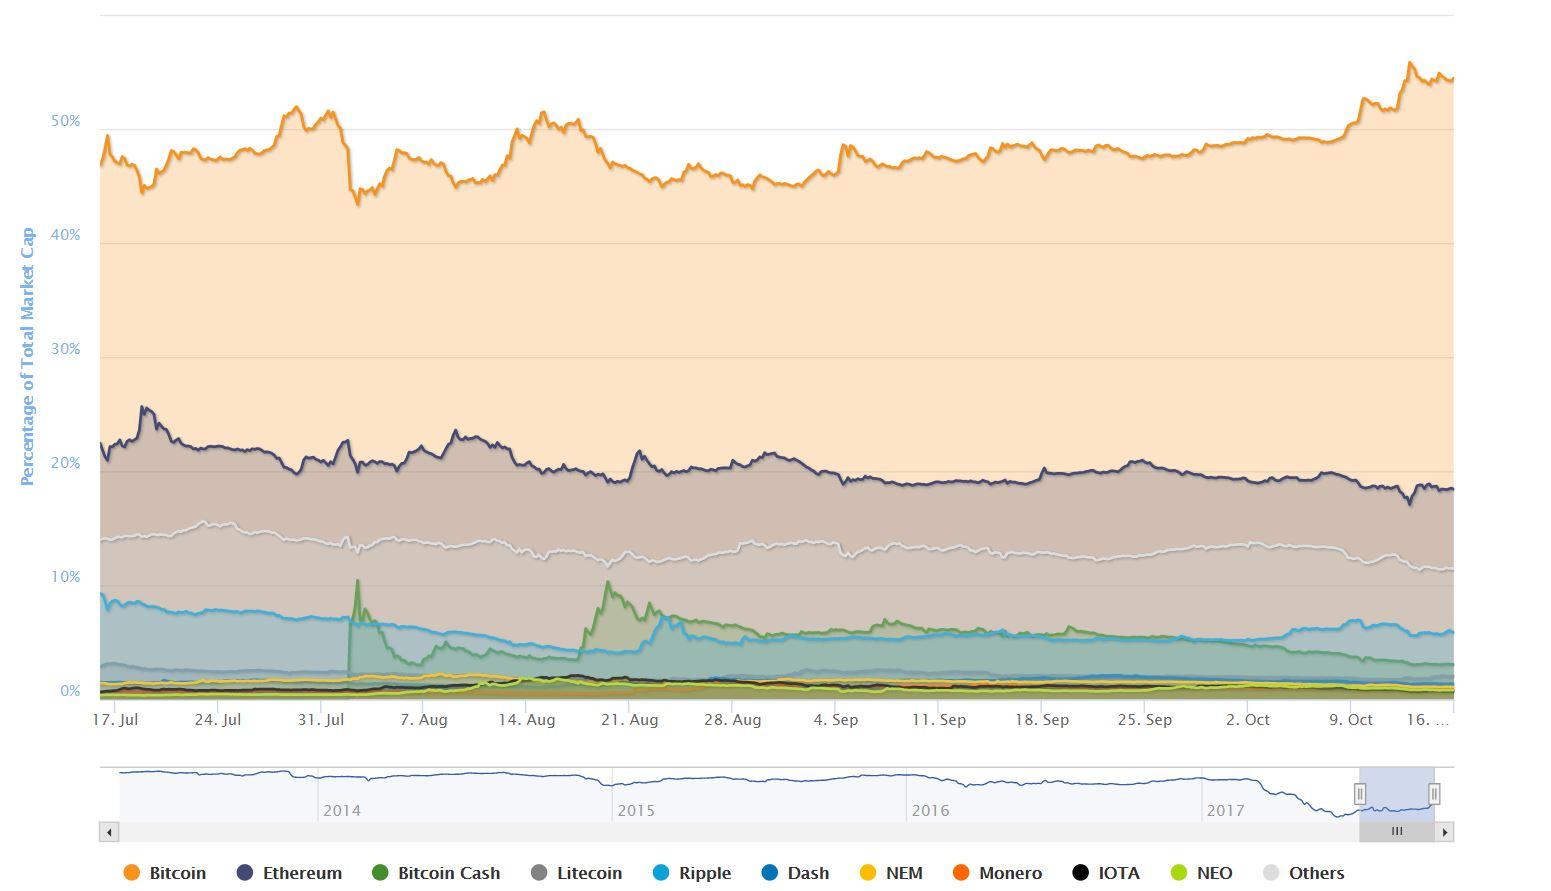 3 Month Bitcoin Dominance Chart